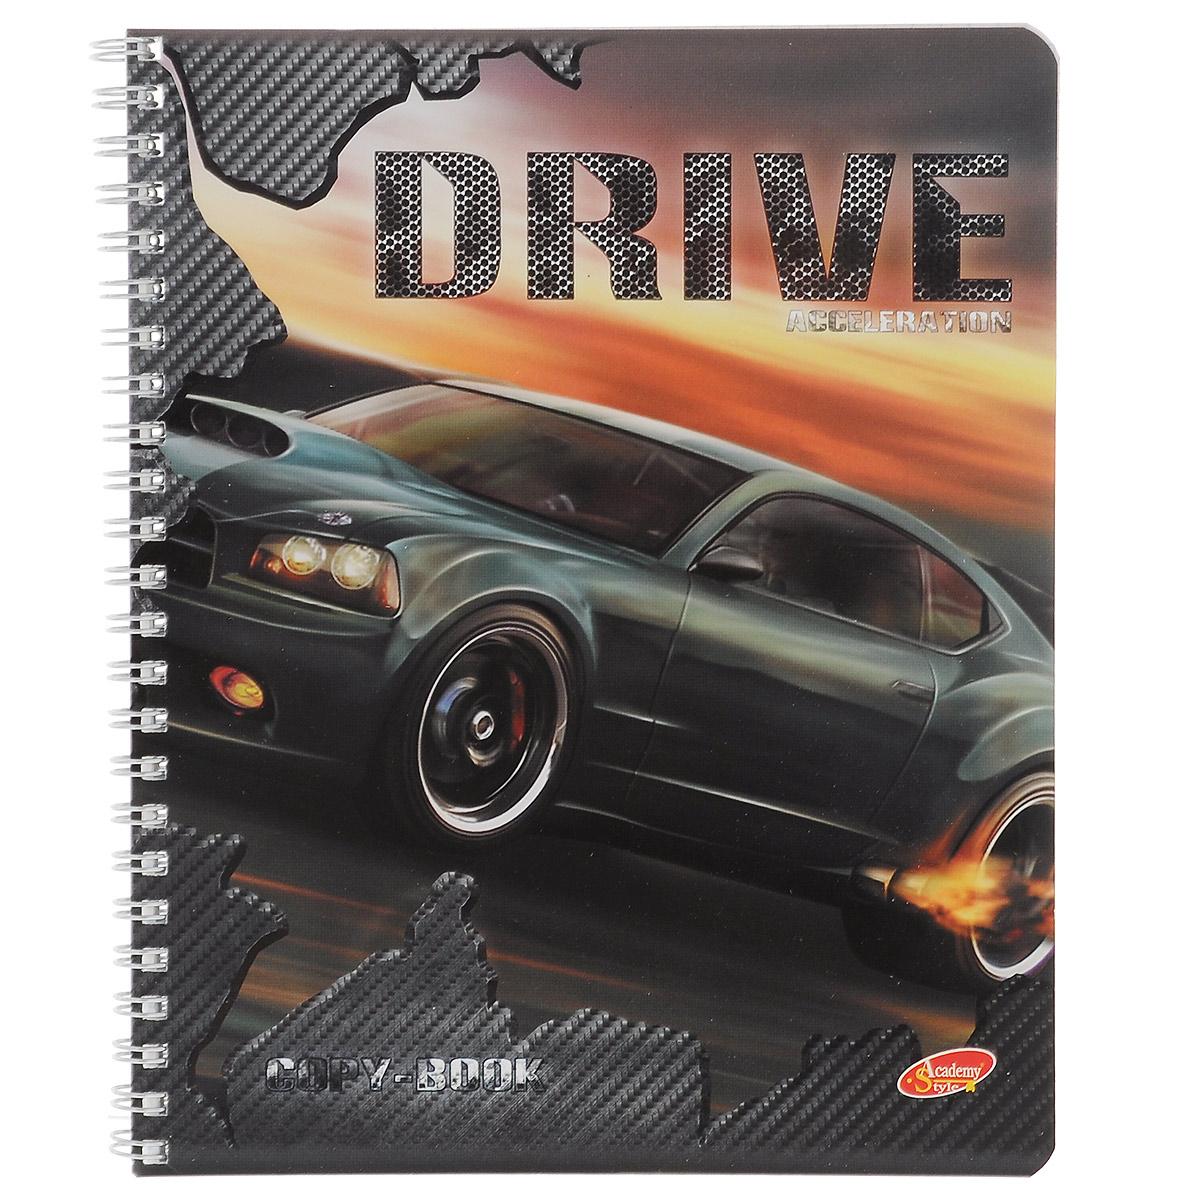 ������� Drive ������� ������, 80 ������, ������ �5, ����: ������� - Academy Style6589/3_������� ������������� � ������ ������� ������ � ��������� ������������ �� ������� �������� ��� ��������, ��� � ���������. ������� ������� � ������������� ������ ��������� �� ������� � ��������� ������������. ���������� ���� ������� �� 80 ������ ����� ������ �� ������. �������� ������� - � ������, ��� �����.